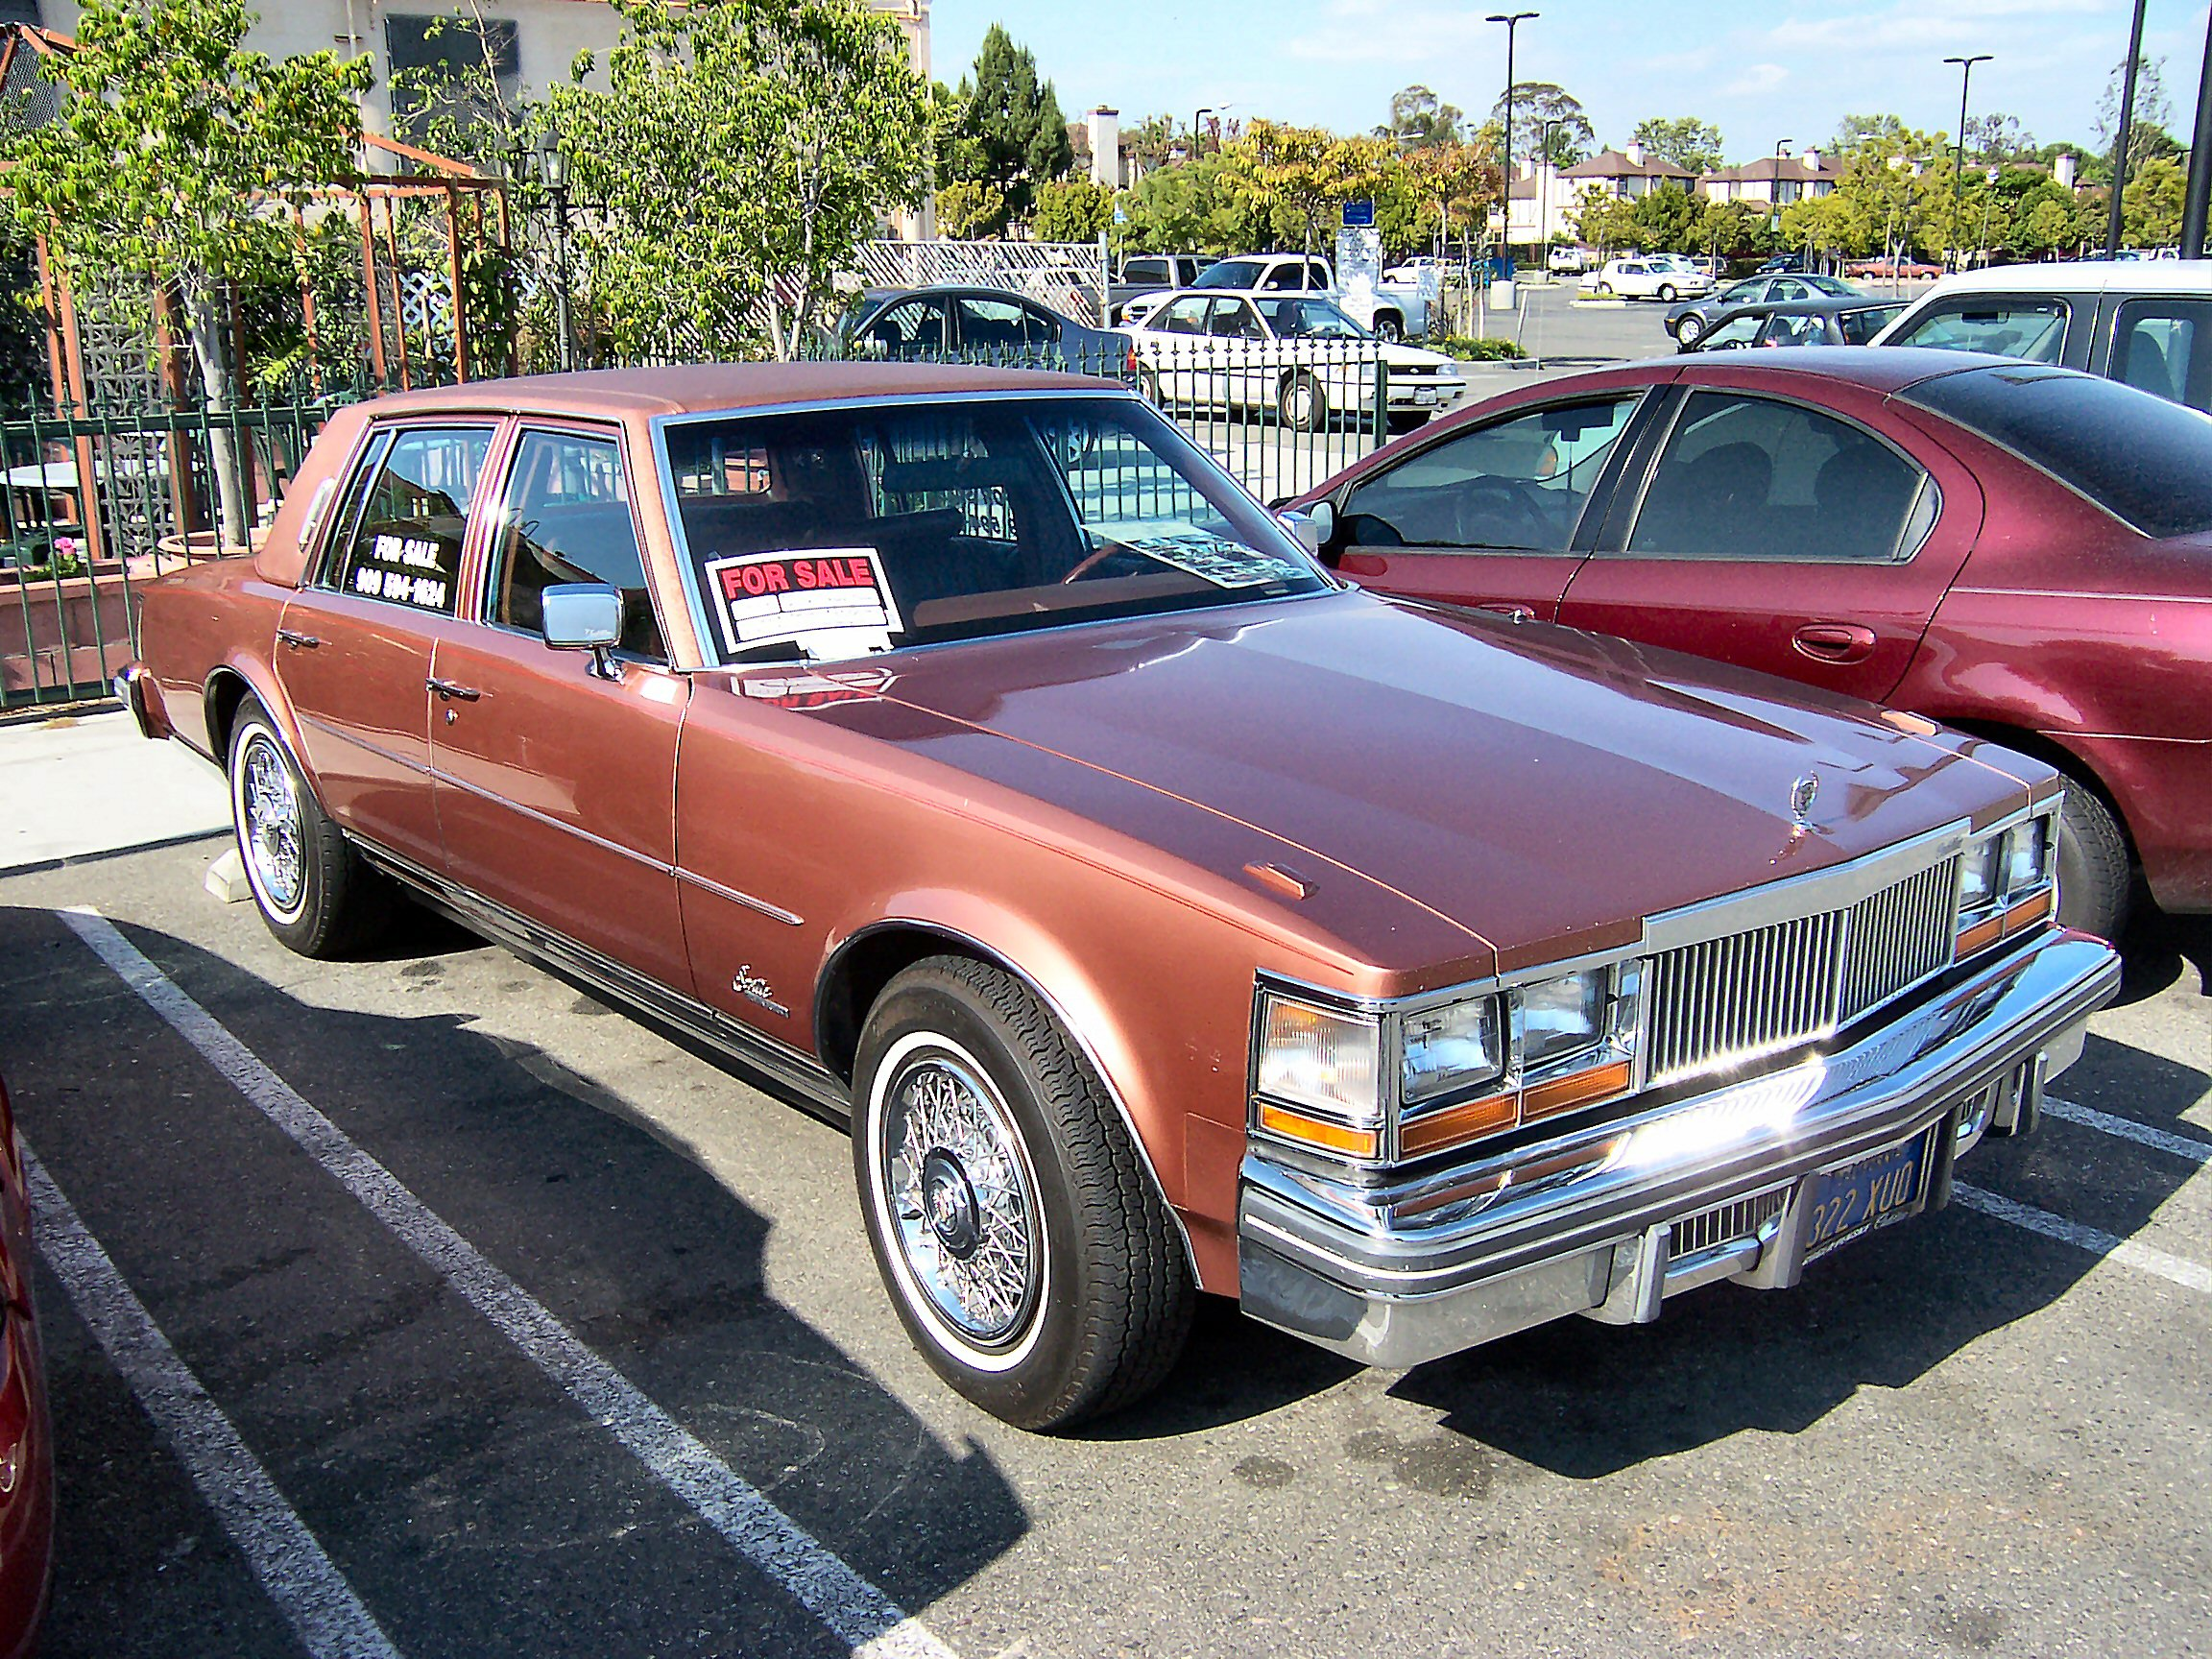 vehicles for cars gaa cadillac limousine classic sale fleetwood